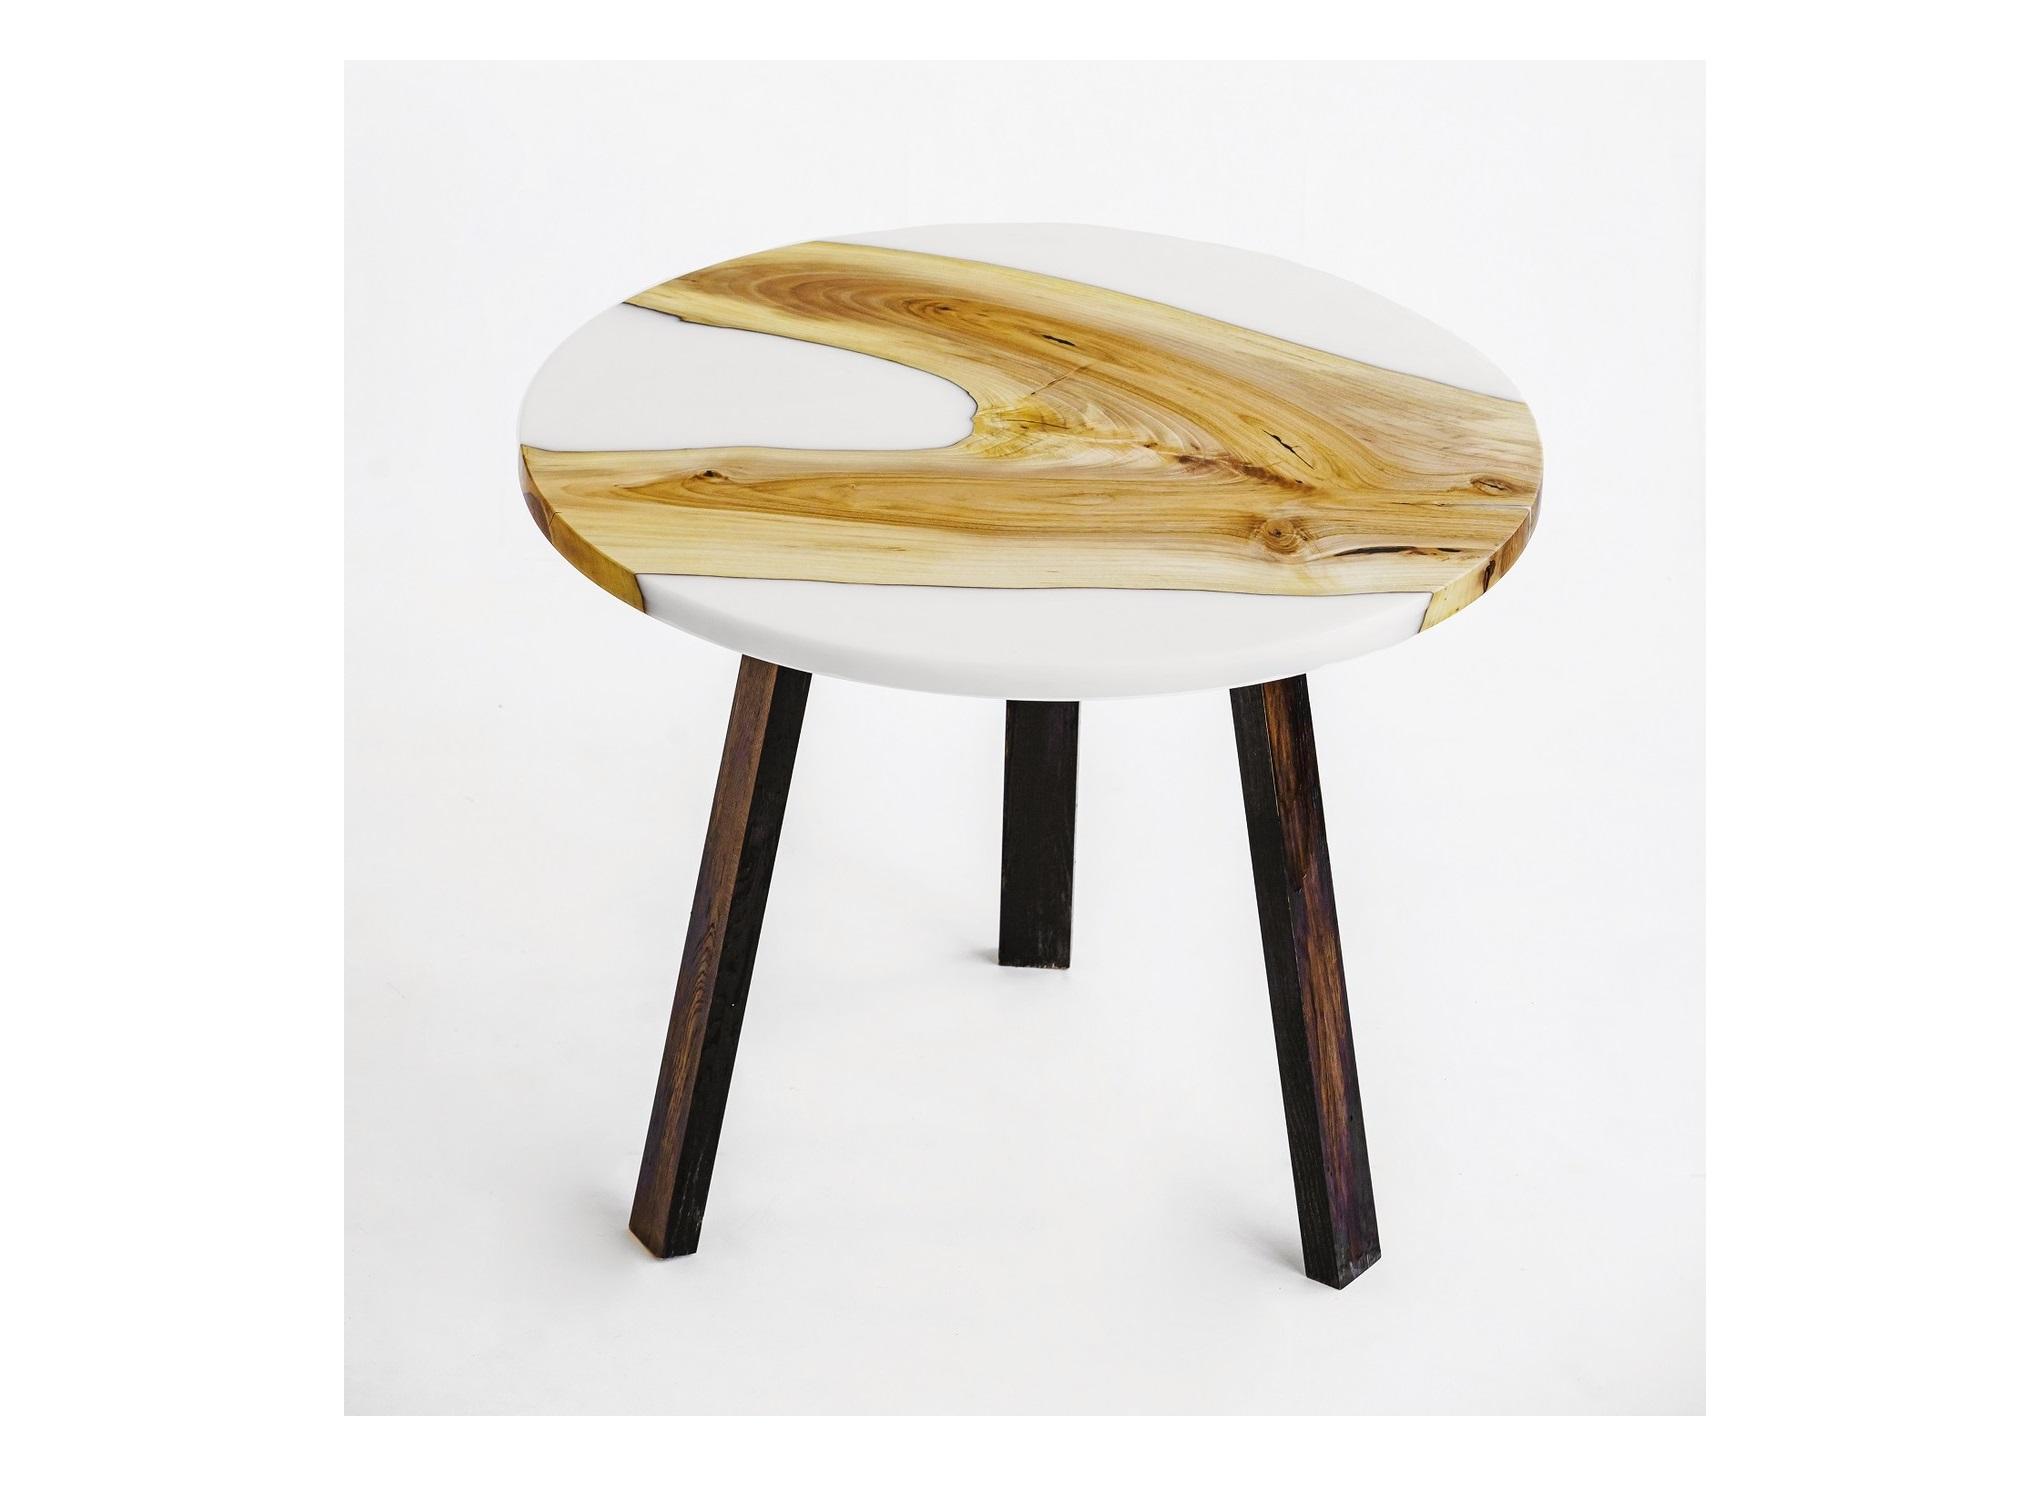 Обеденный стол (woodzpro) коричневый 90x75 см.